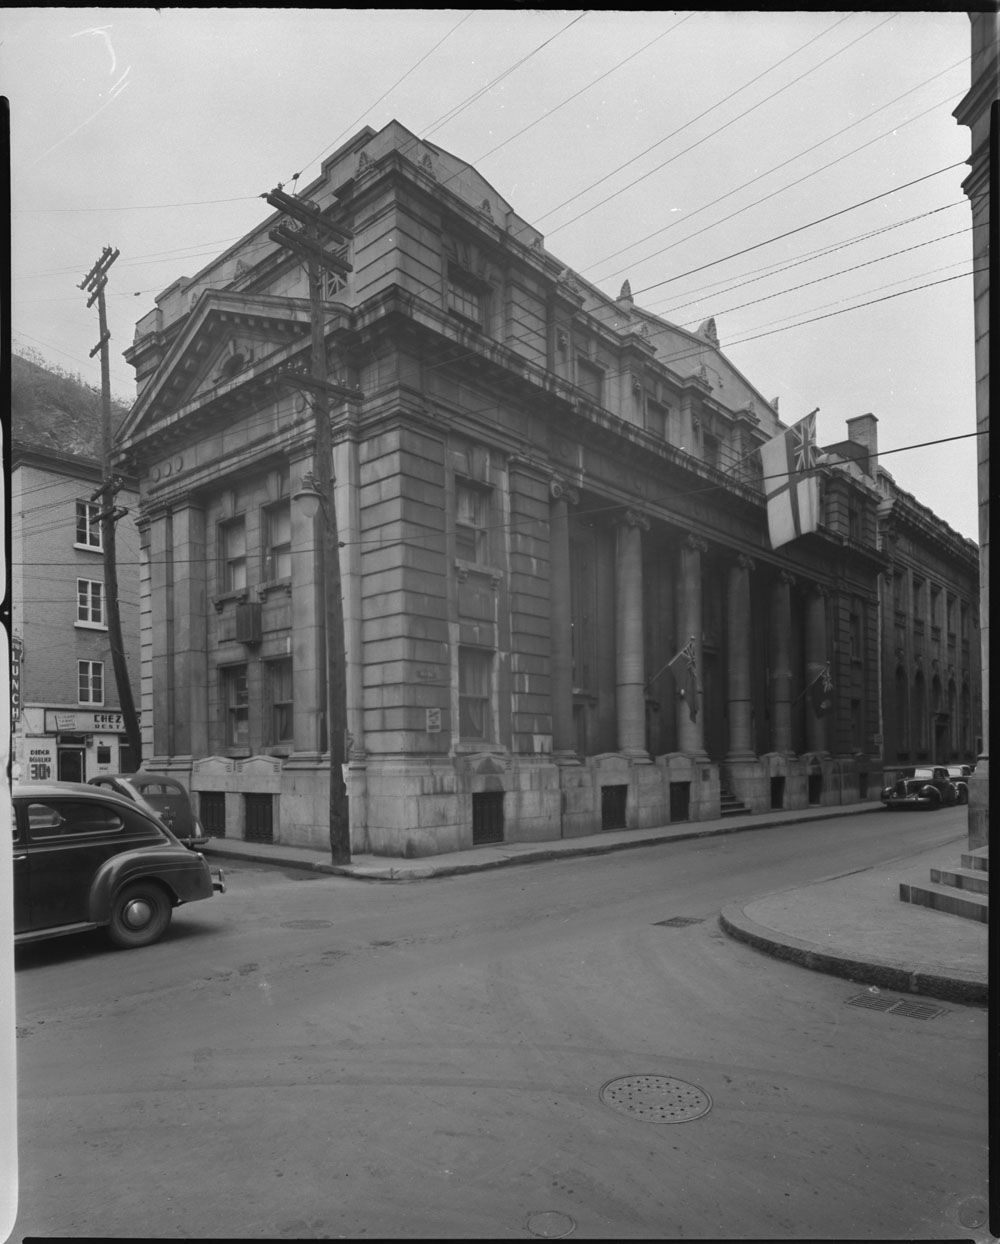 Knights of Columbus Hostel on St. Peter Street, Québec City in 1943